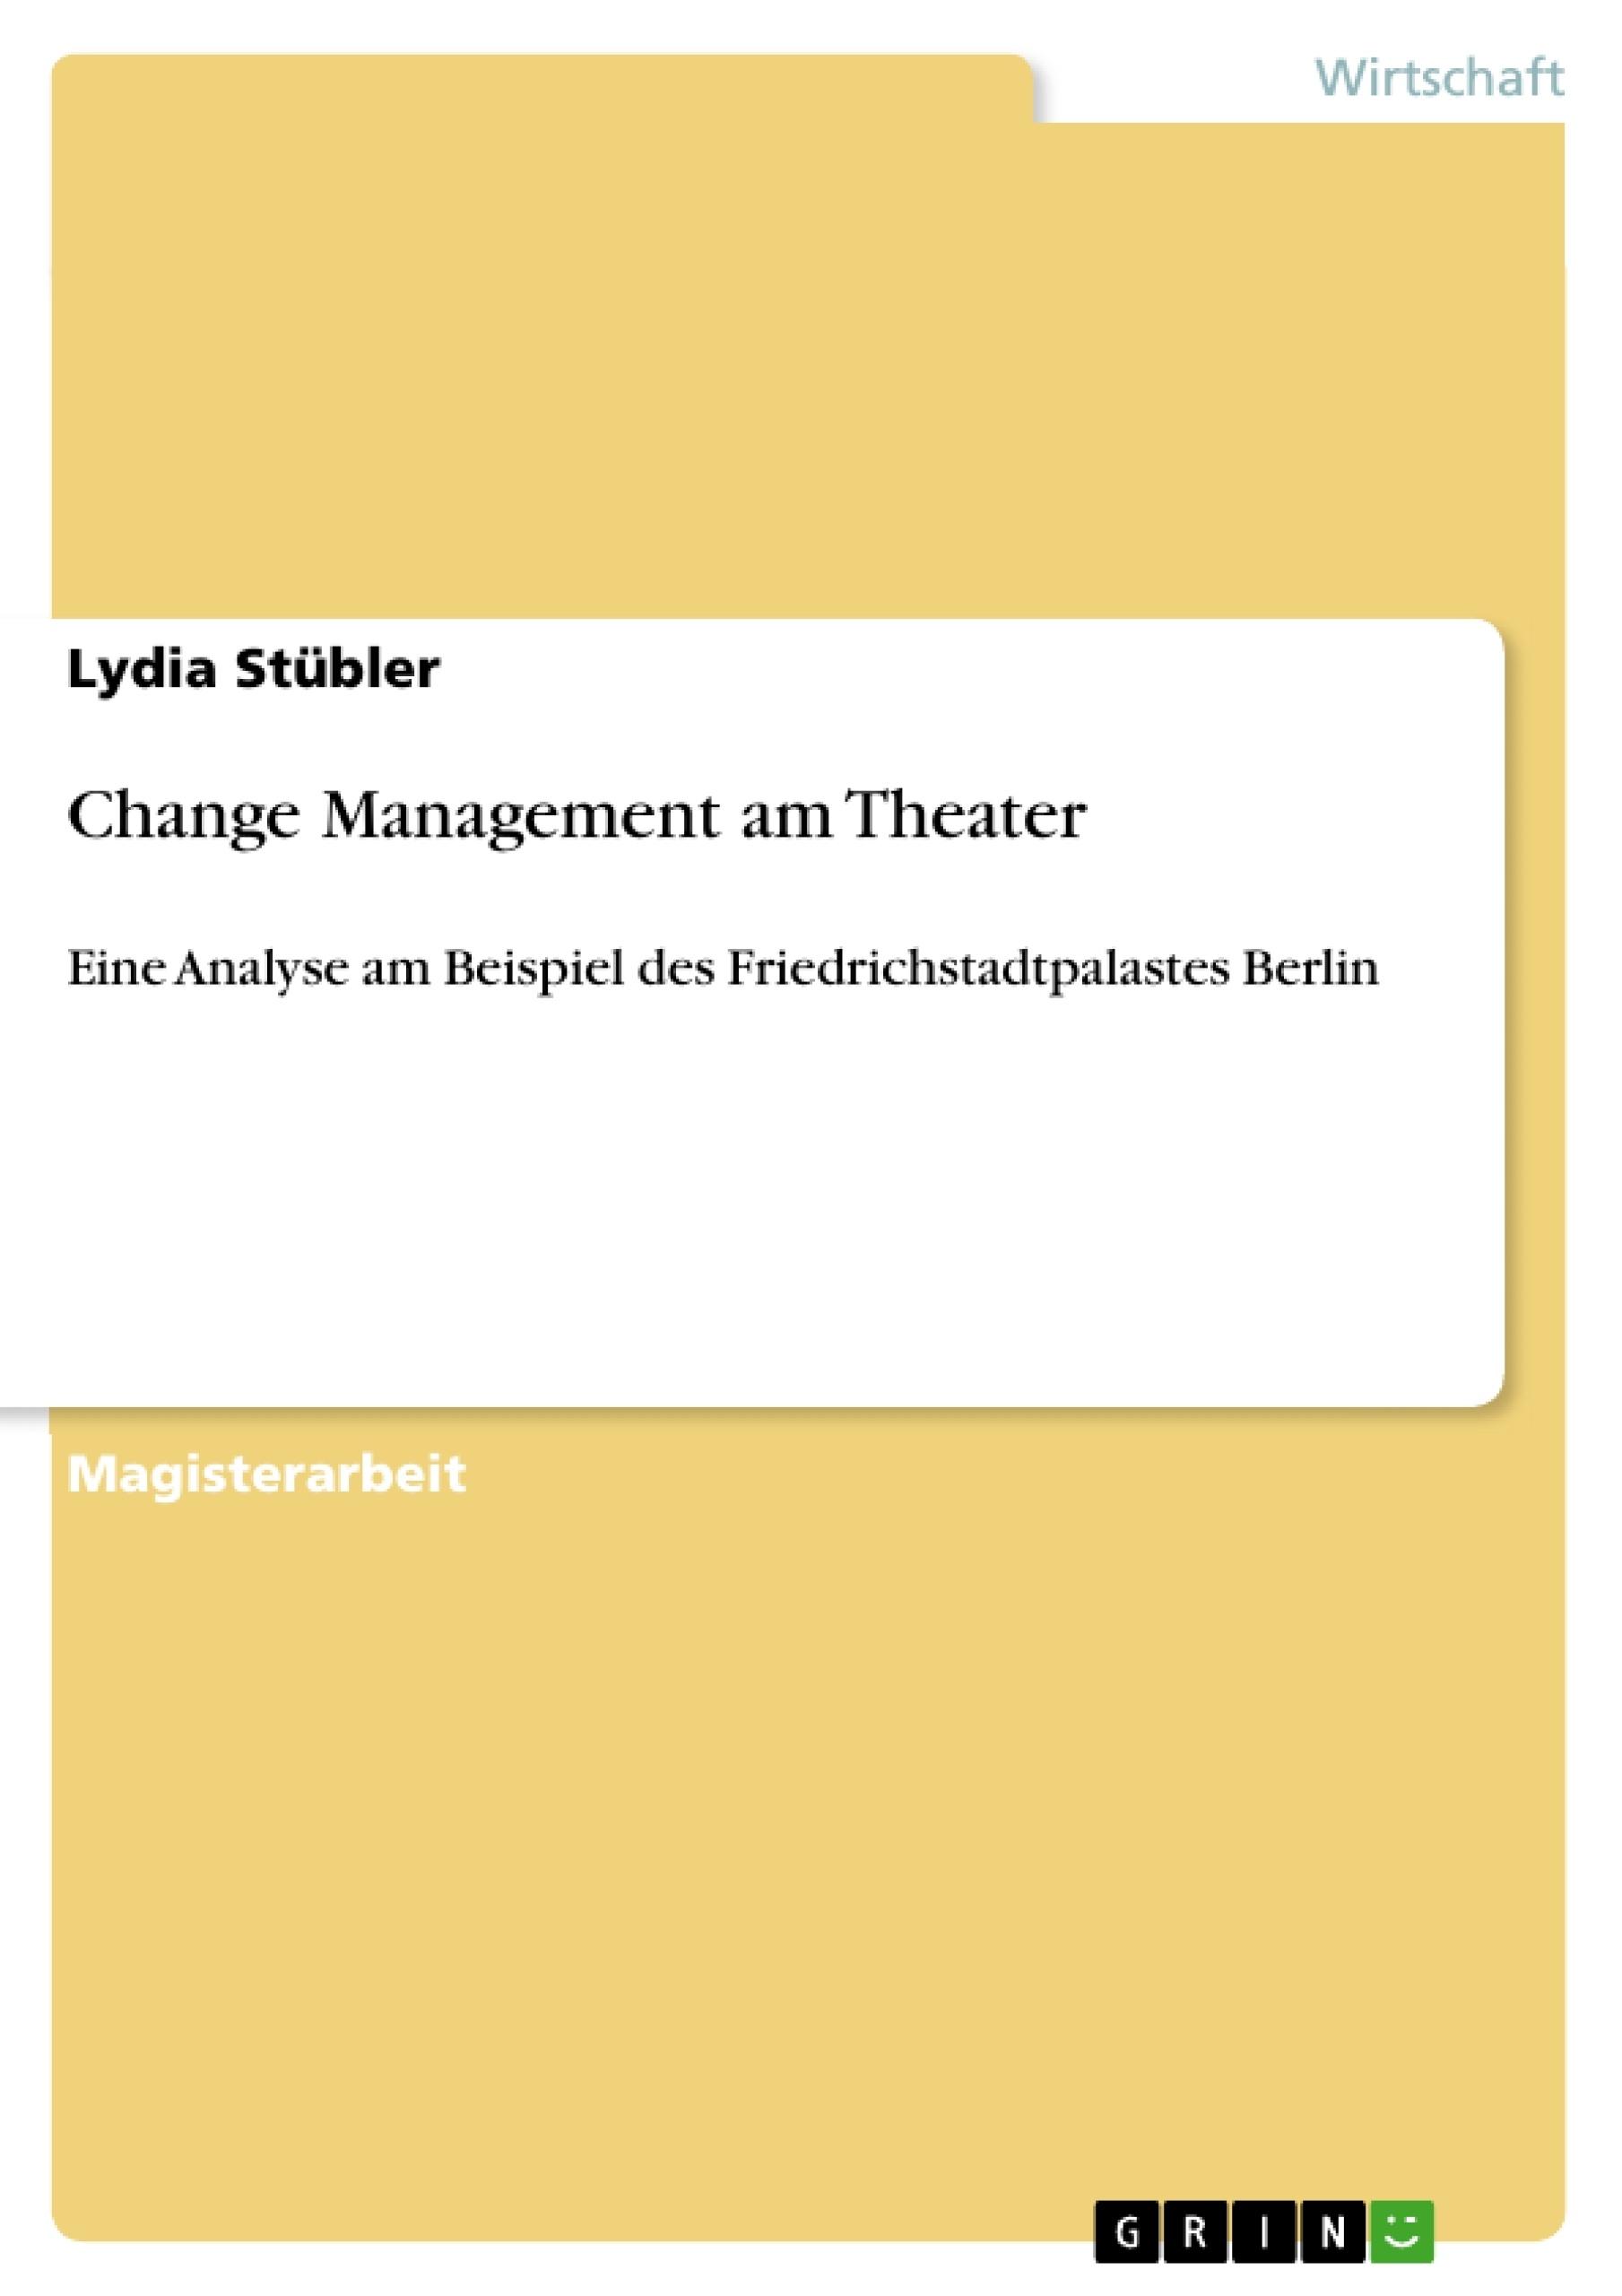 Titel: Change Management am Theater